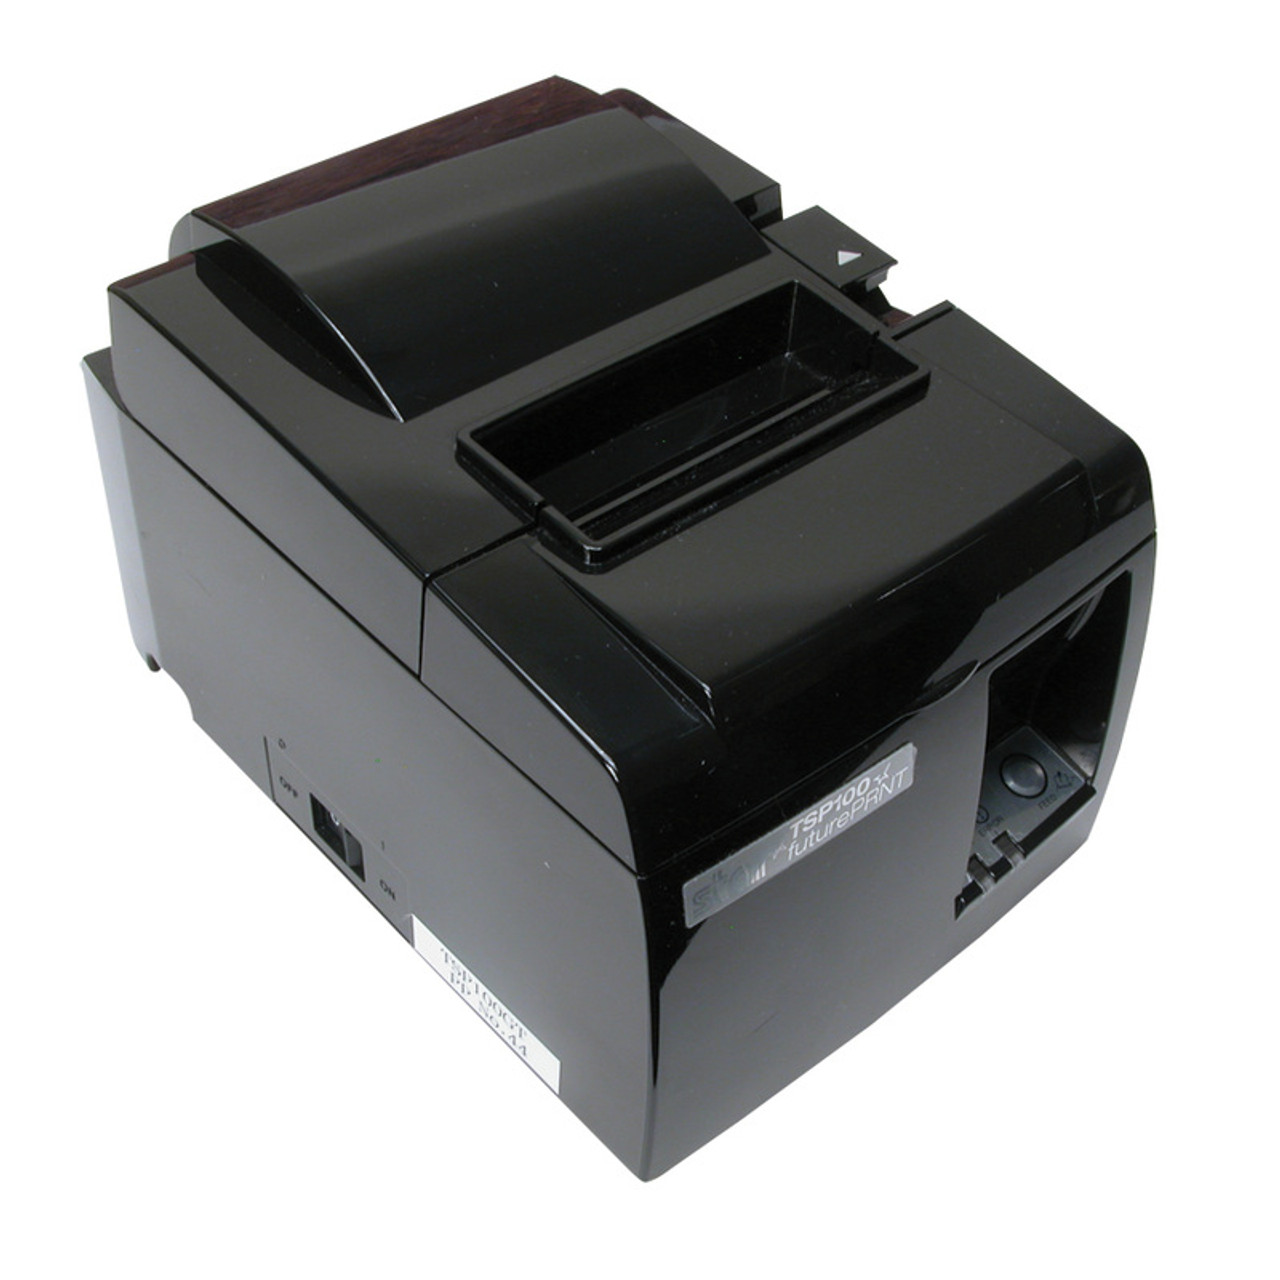 Star TSP100GT POS Thermal Receipt Printer Series, TSP113UGT-BLK